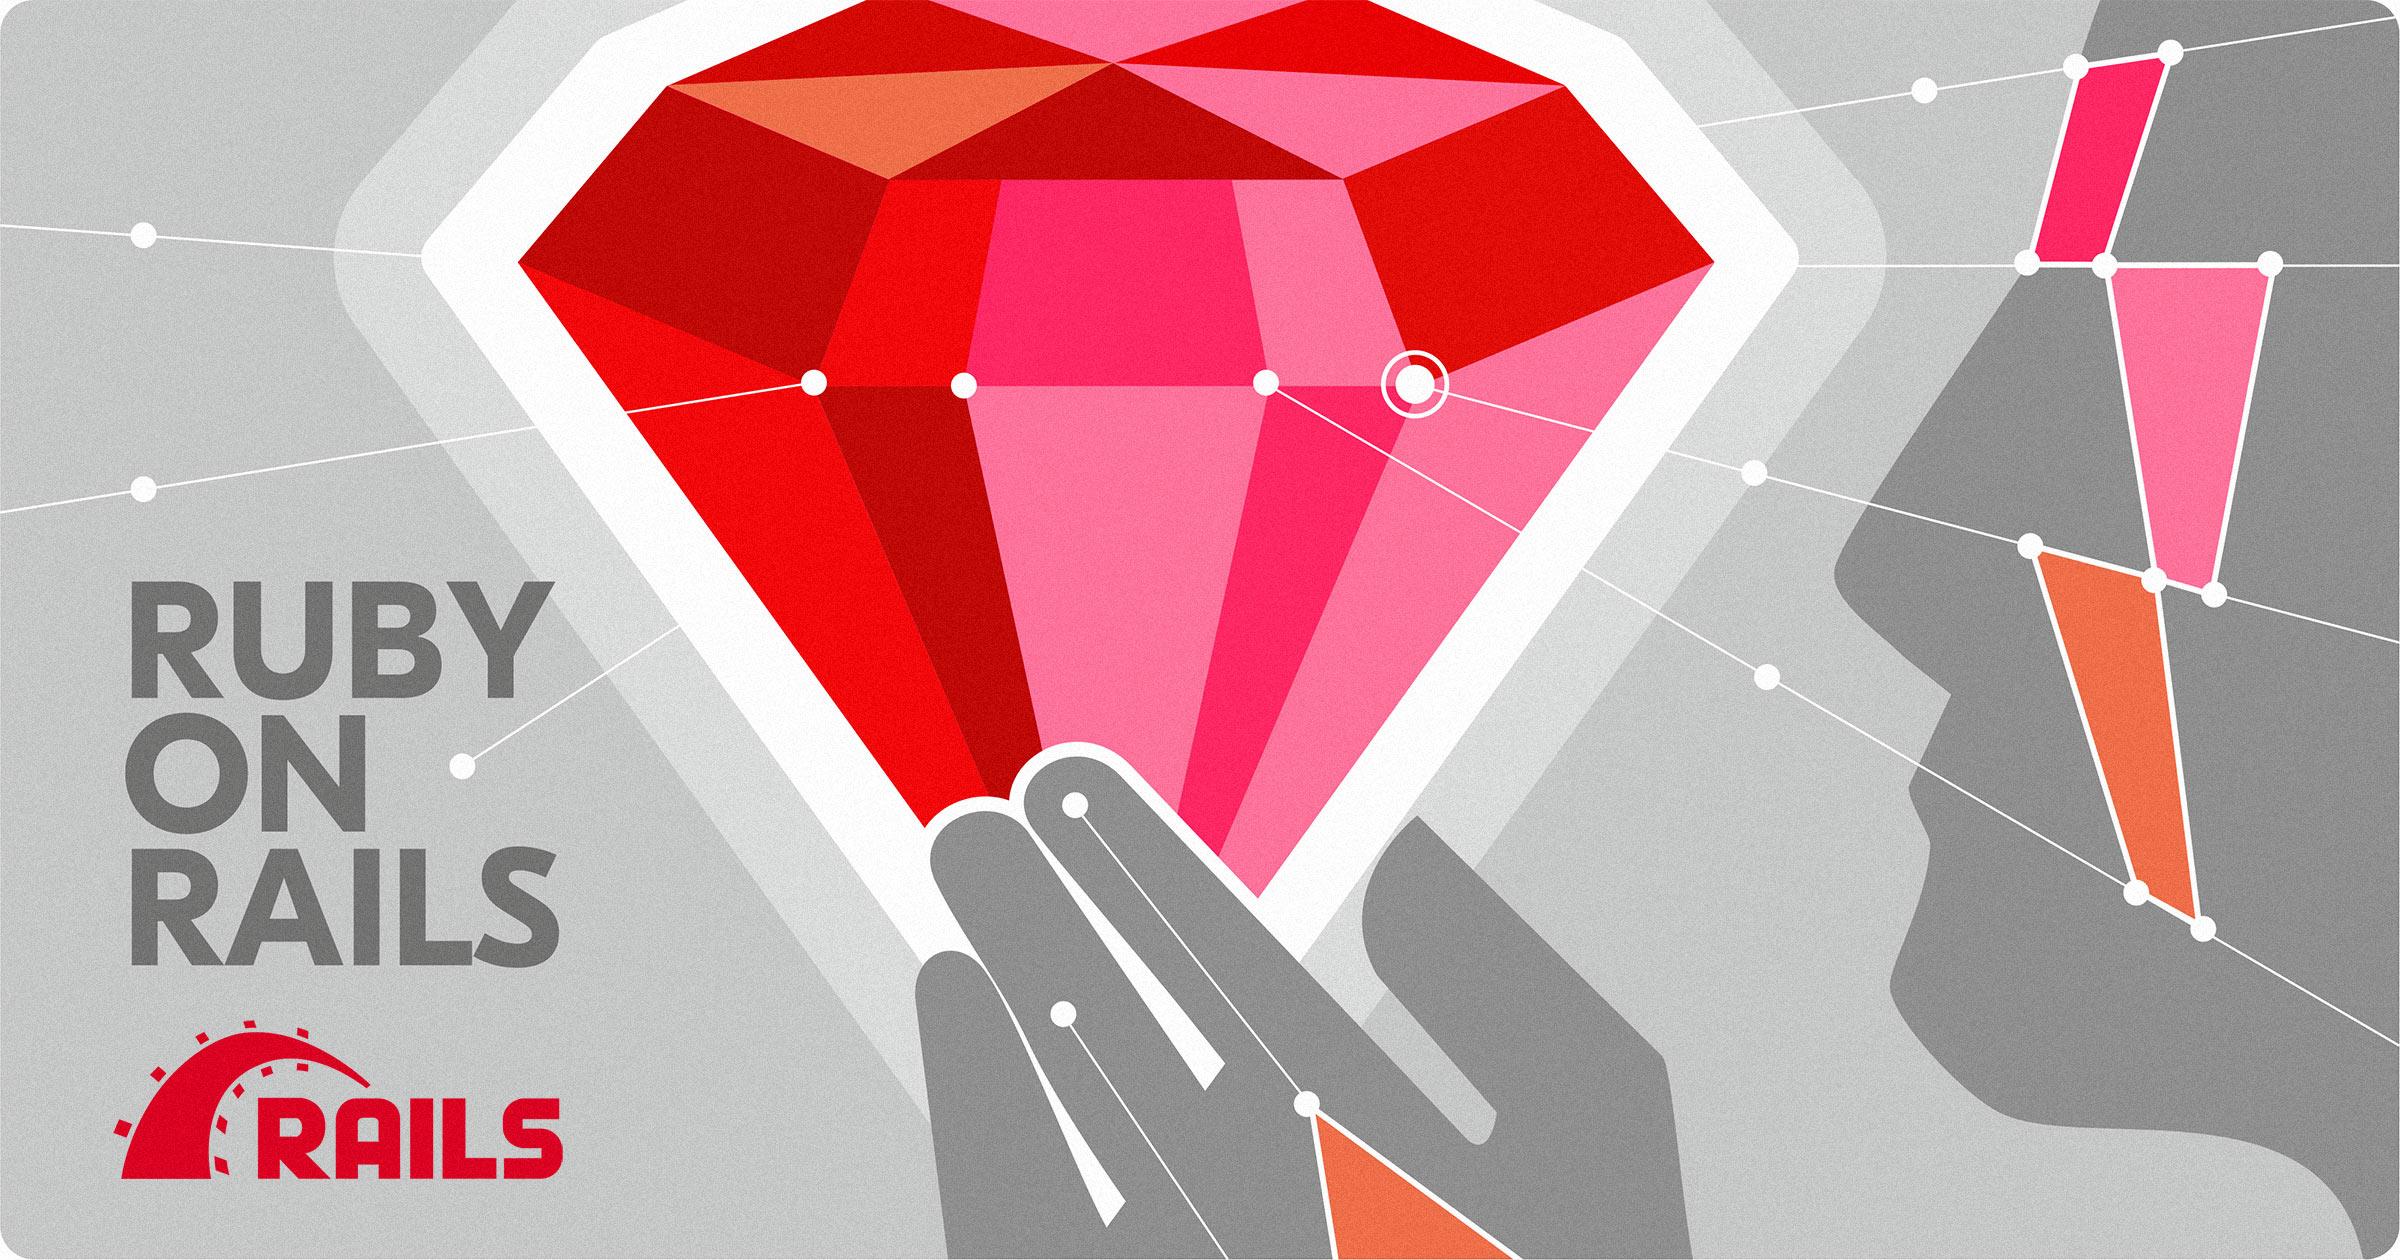 Guide on Ruby on Rails framework